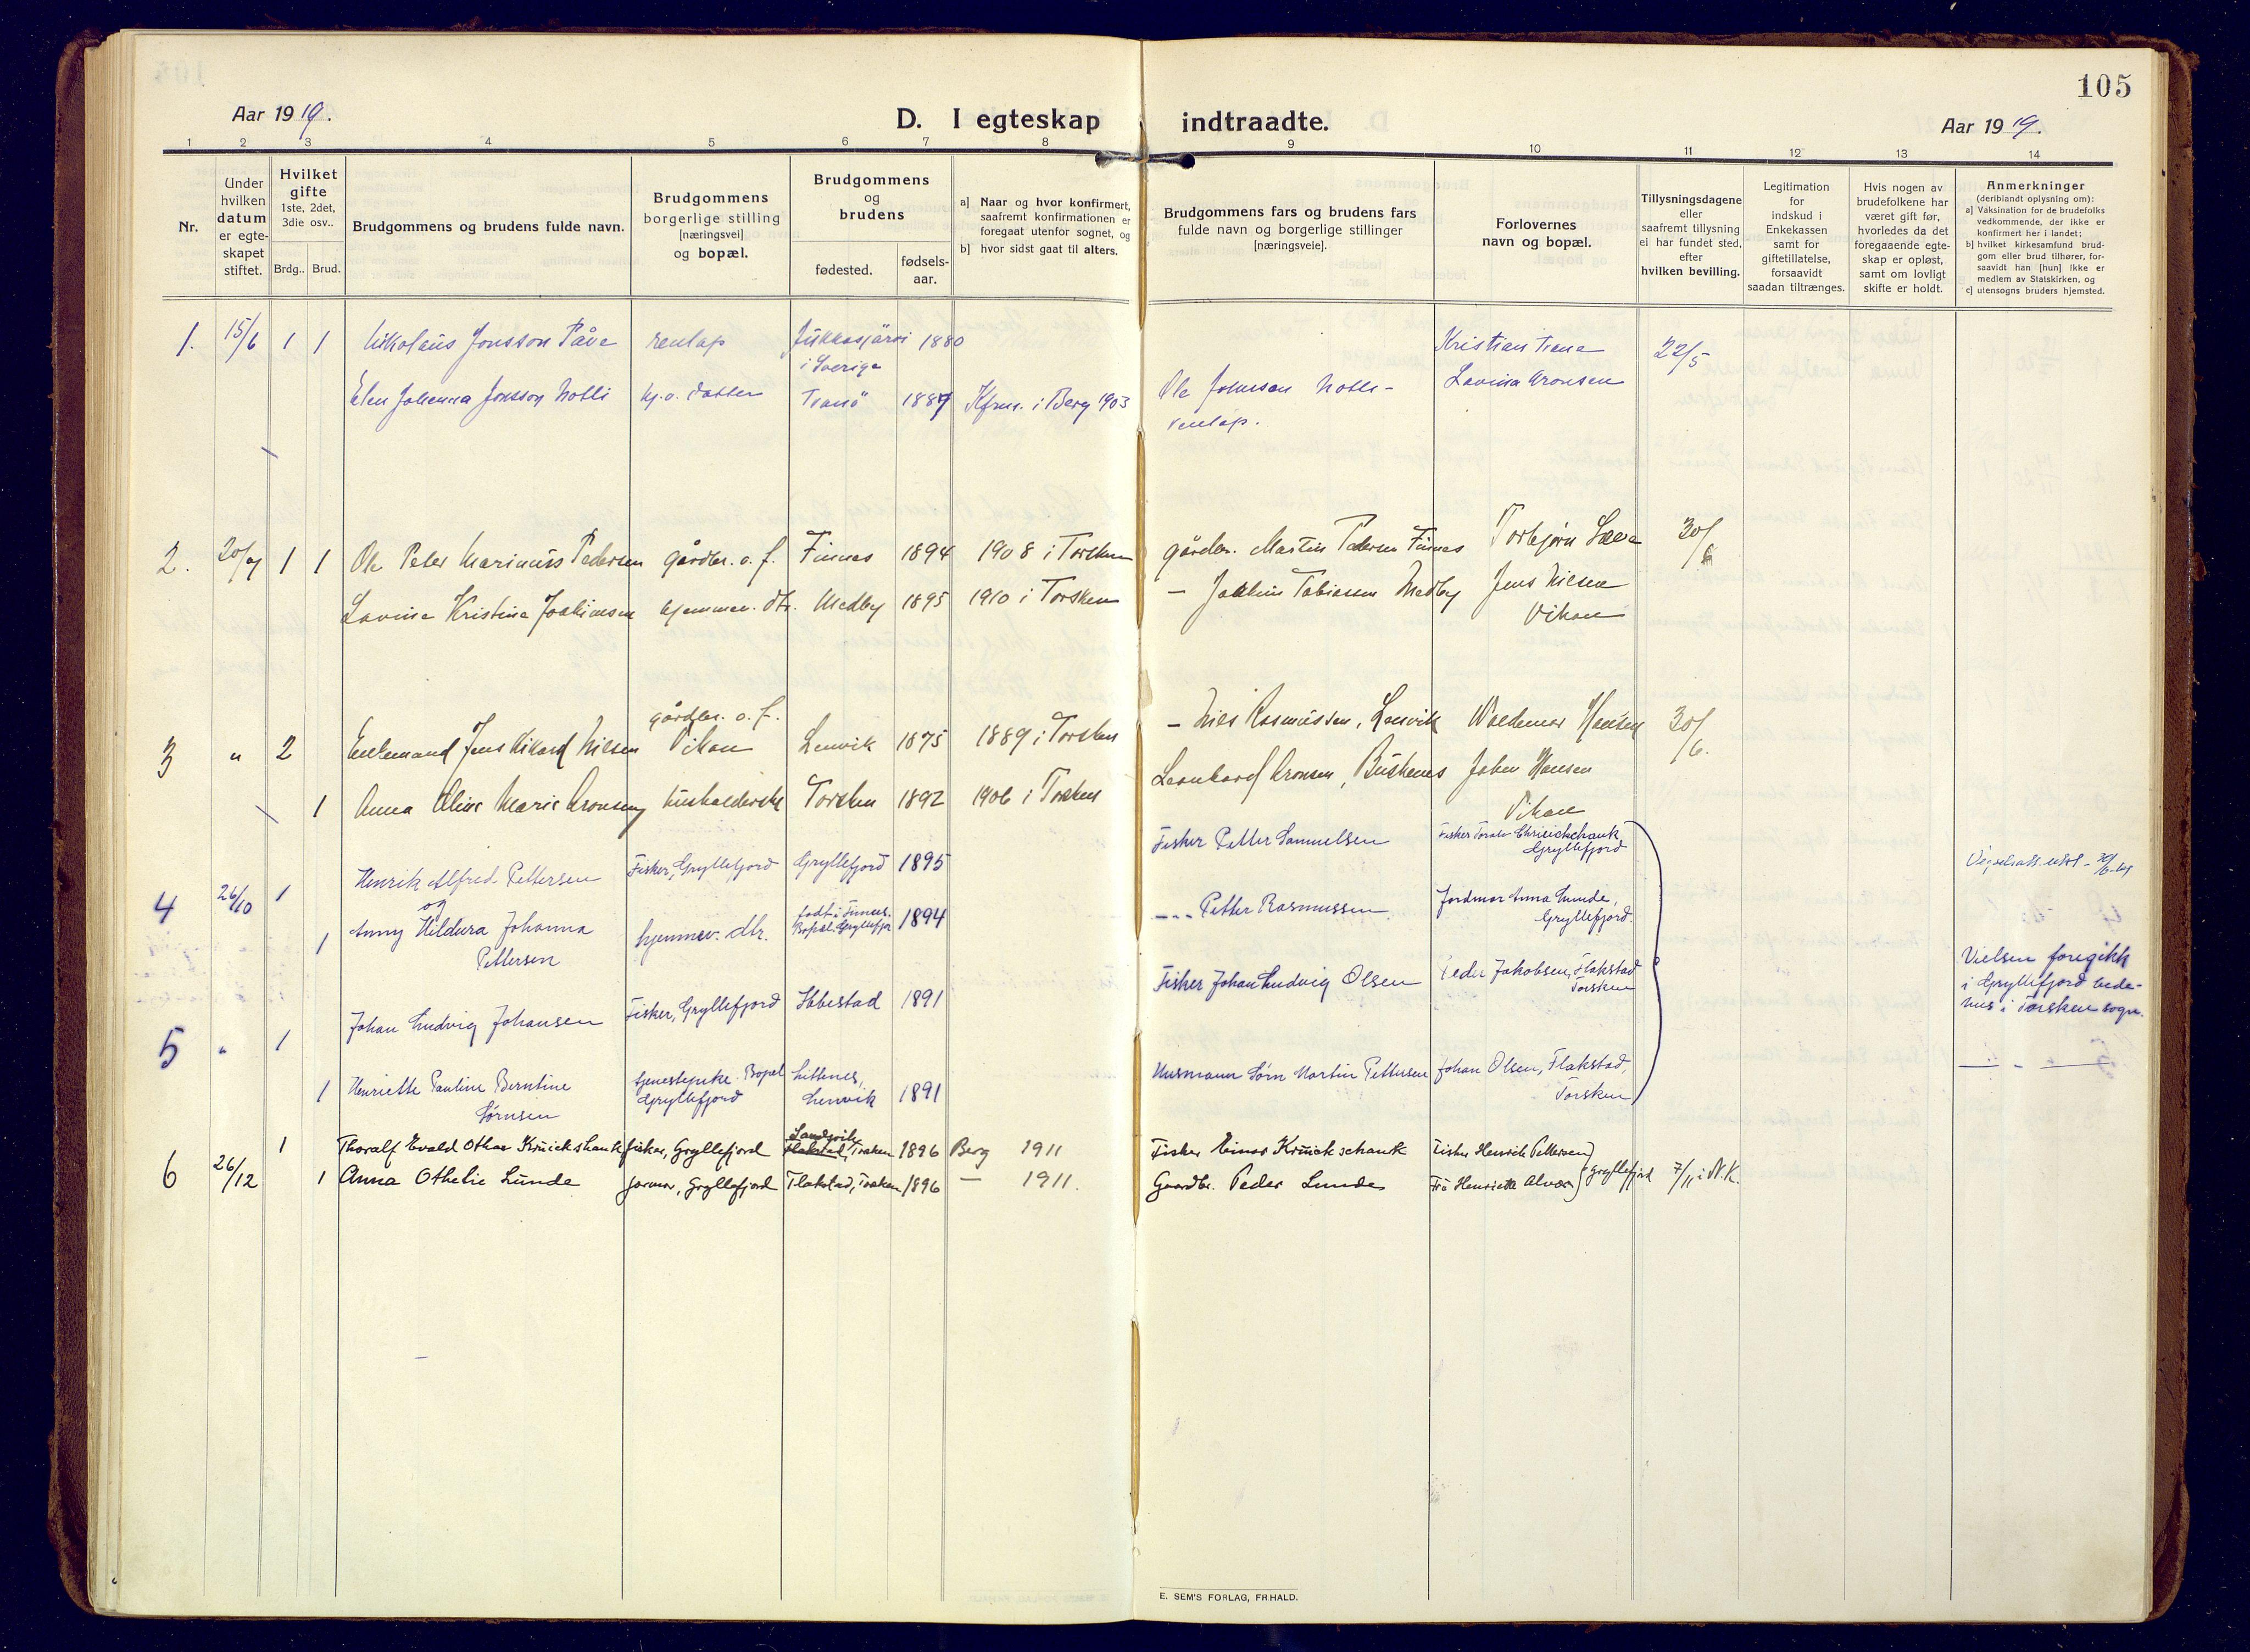 SATØ, Mefjord/Berg sokneprestkontor, G/Ga/Gaa: Ministerialbok nr. 10, 1916-1928, s. 105